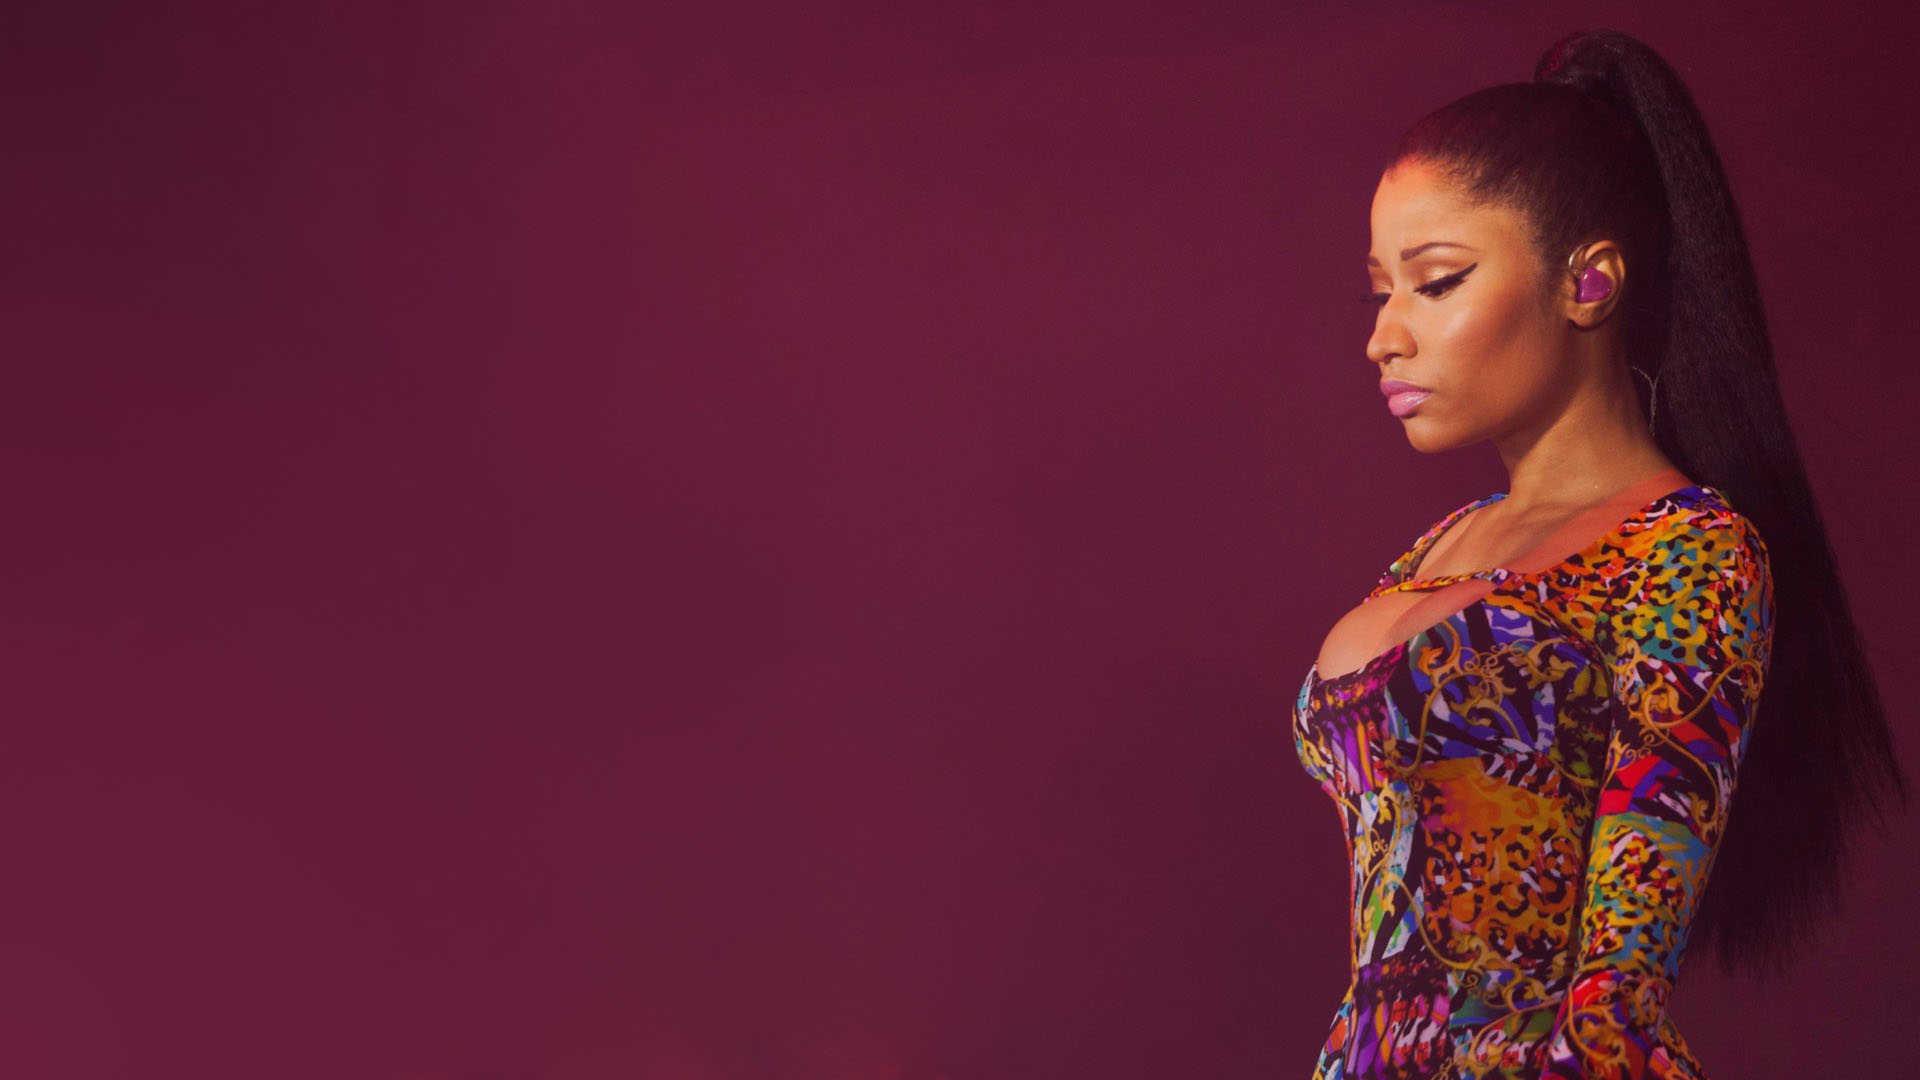 Res: 1920x1080, Nicki Minaj 2015 Wallpapers High Resolution